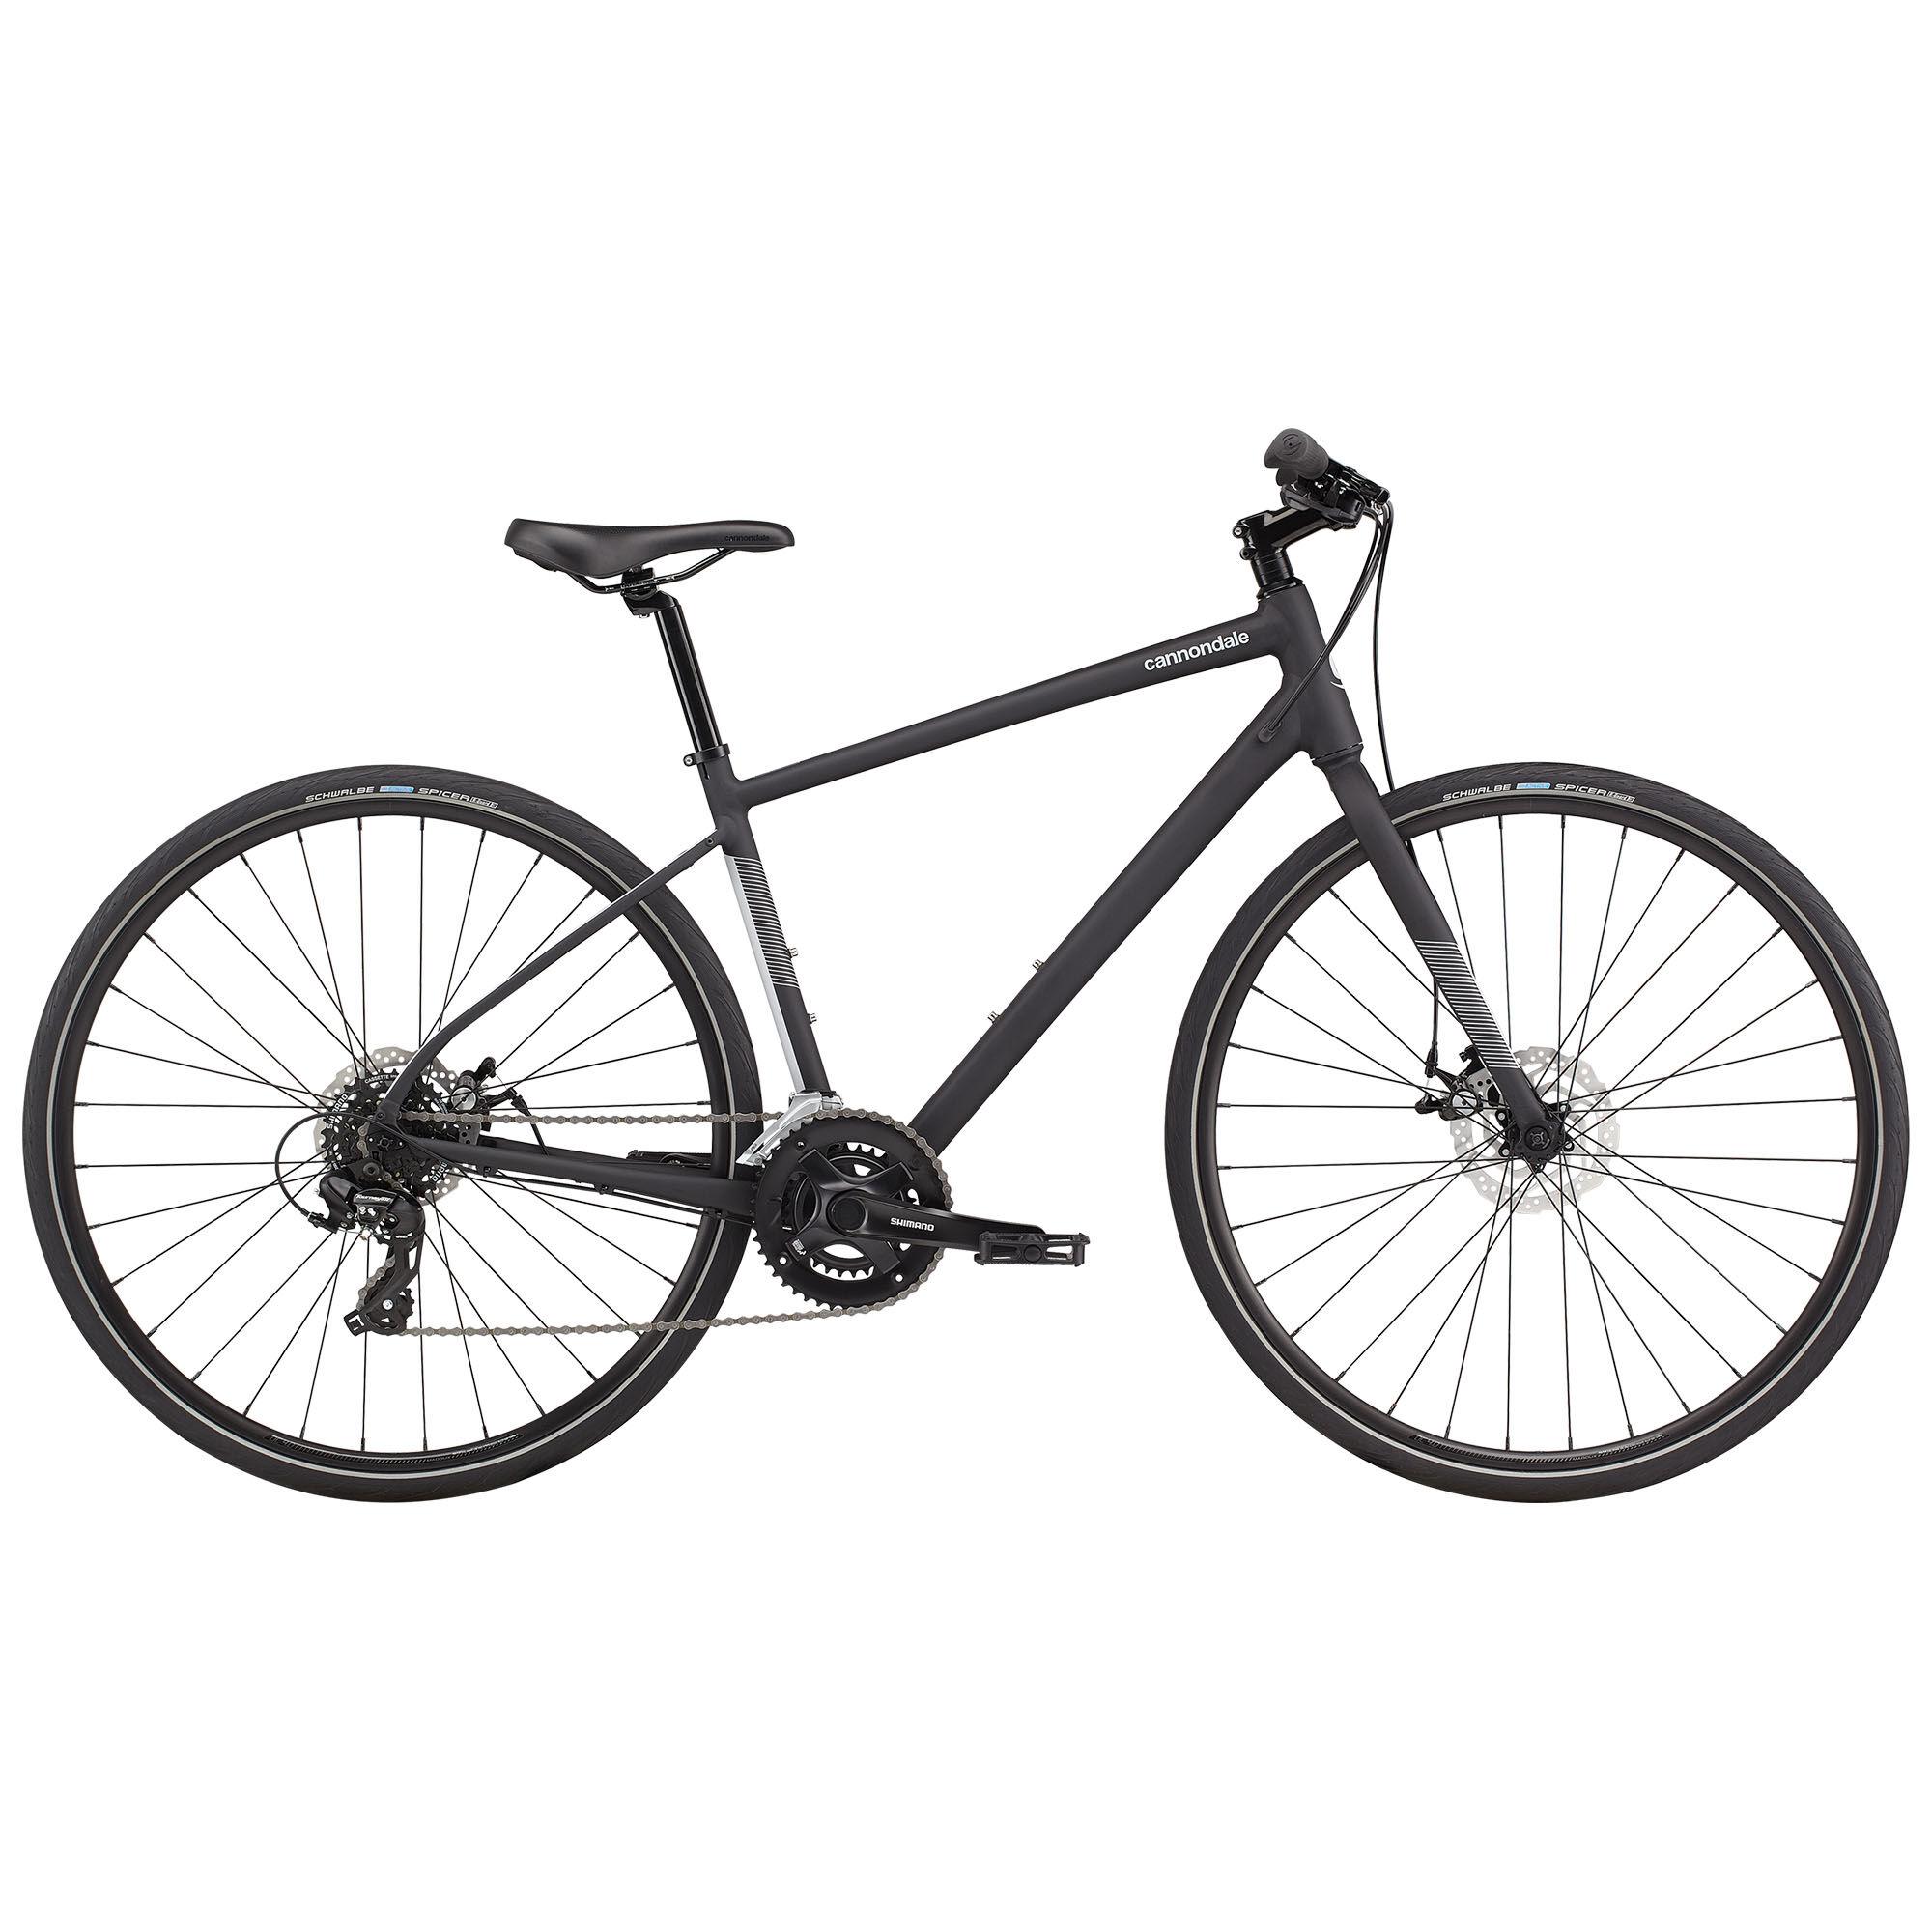 Cannondale Quick 5 Urban Bike '21  - Matte Black - Size: Small